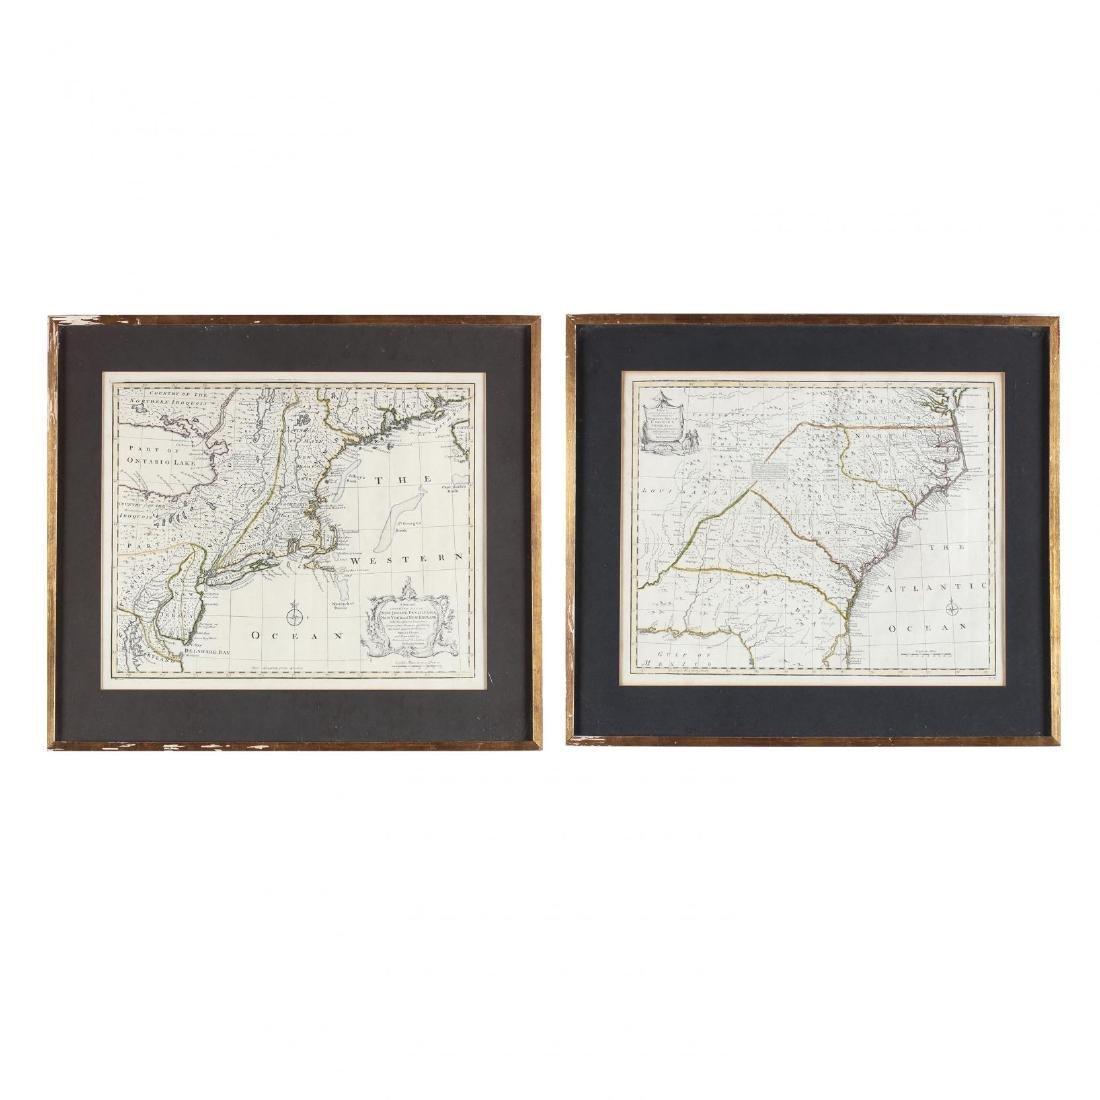 Two Emanuel Bowen Maps Showing the East Coast